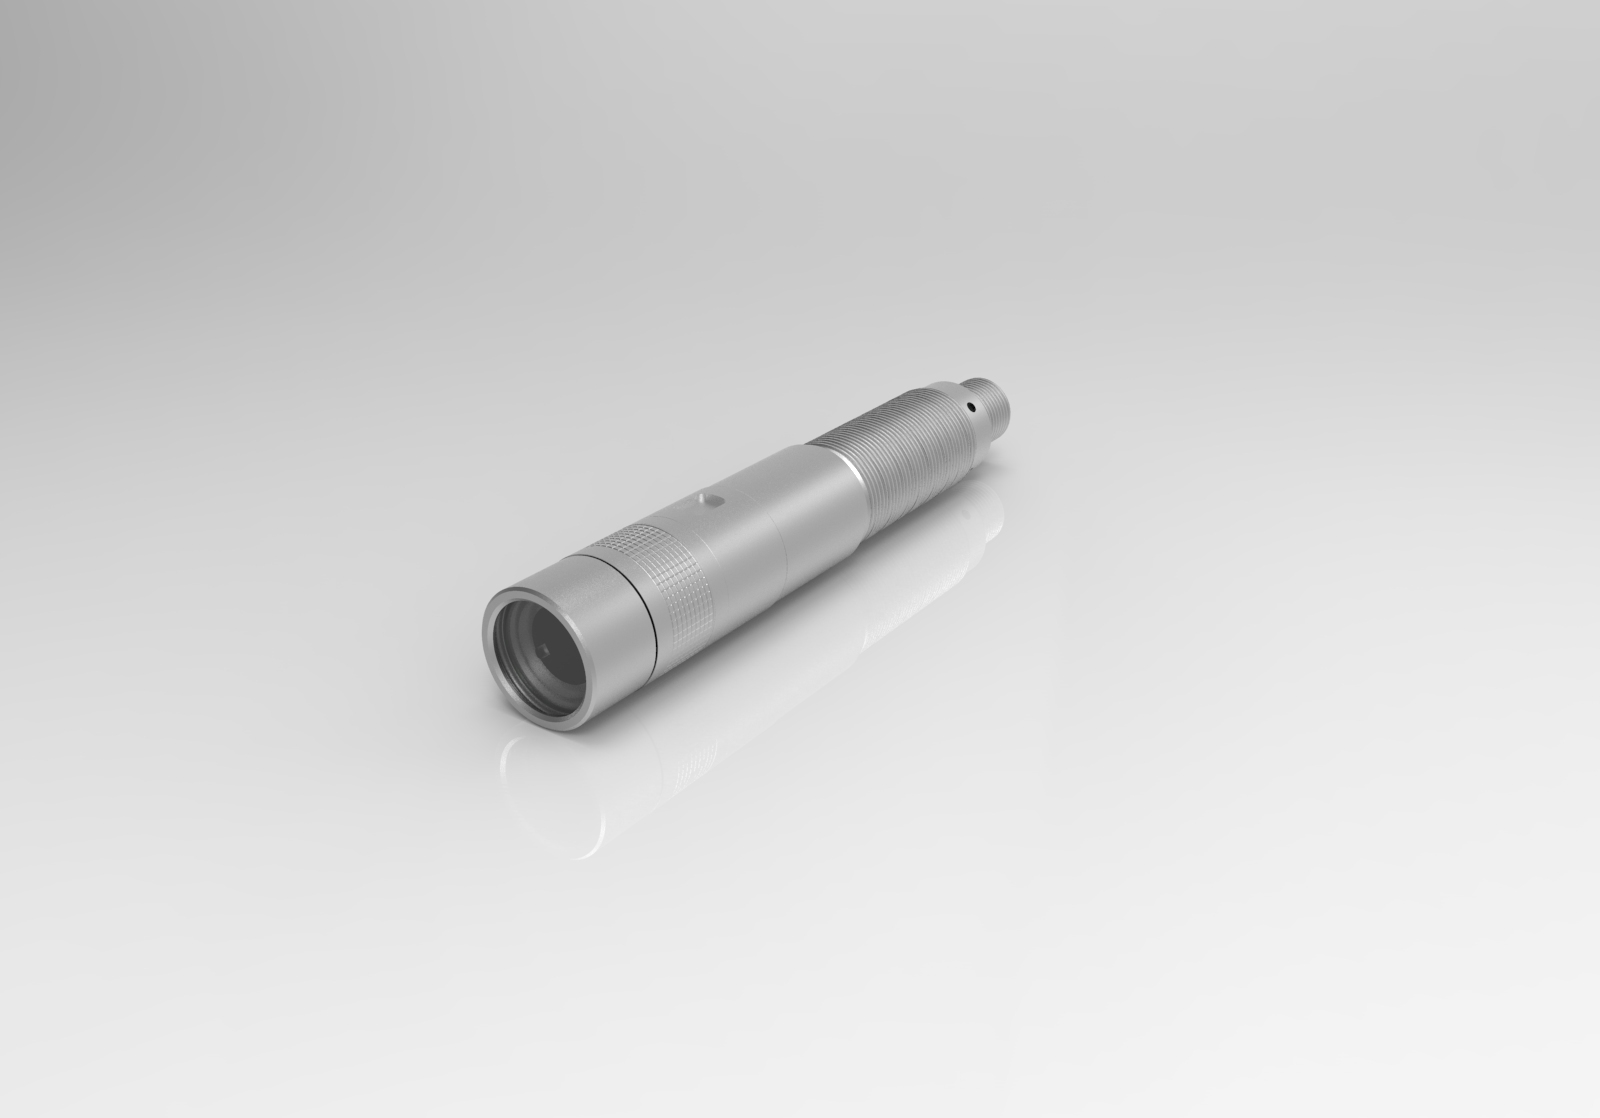 (Bild: Z-Laser Optoelektronik GmbH)